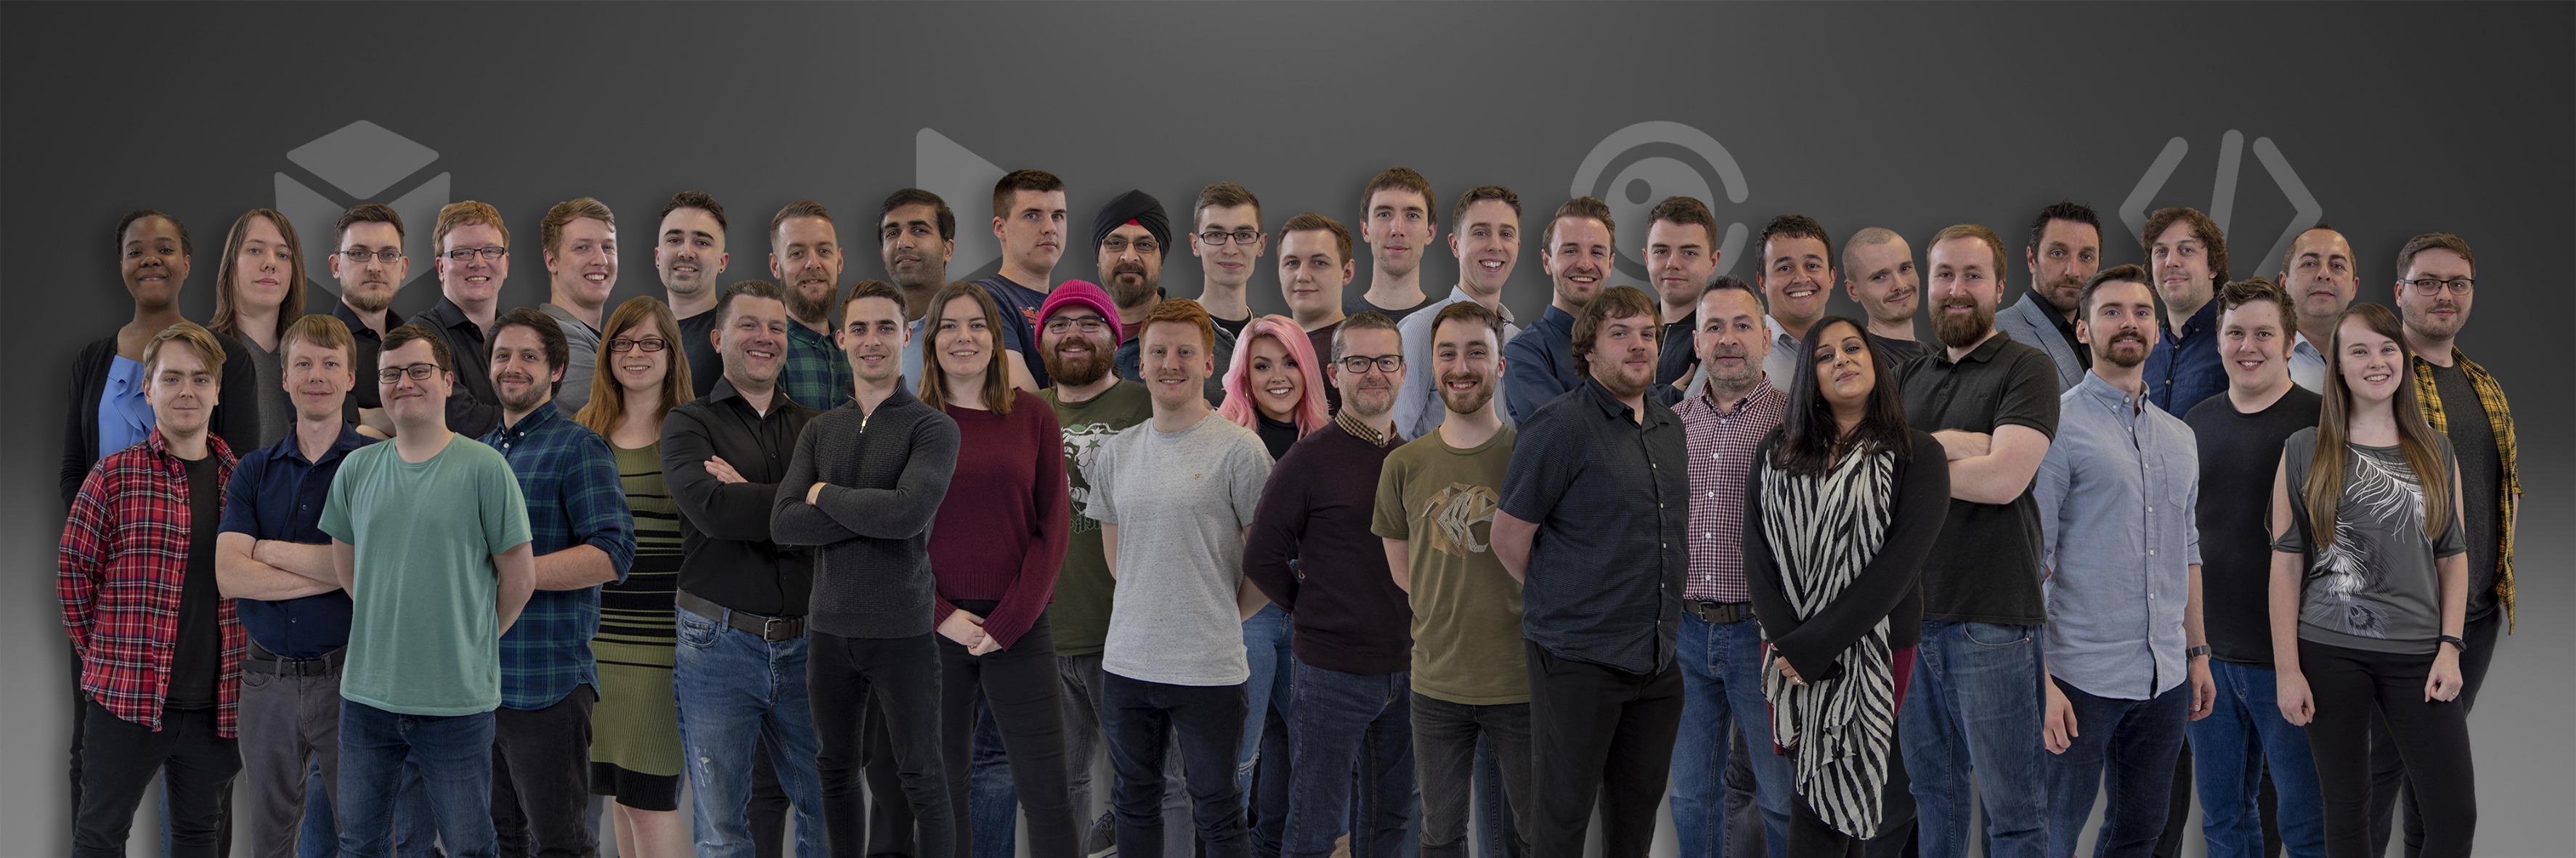 The team at Bloc Digital